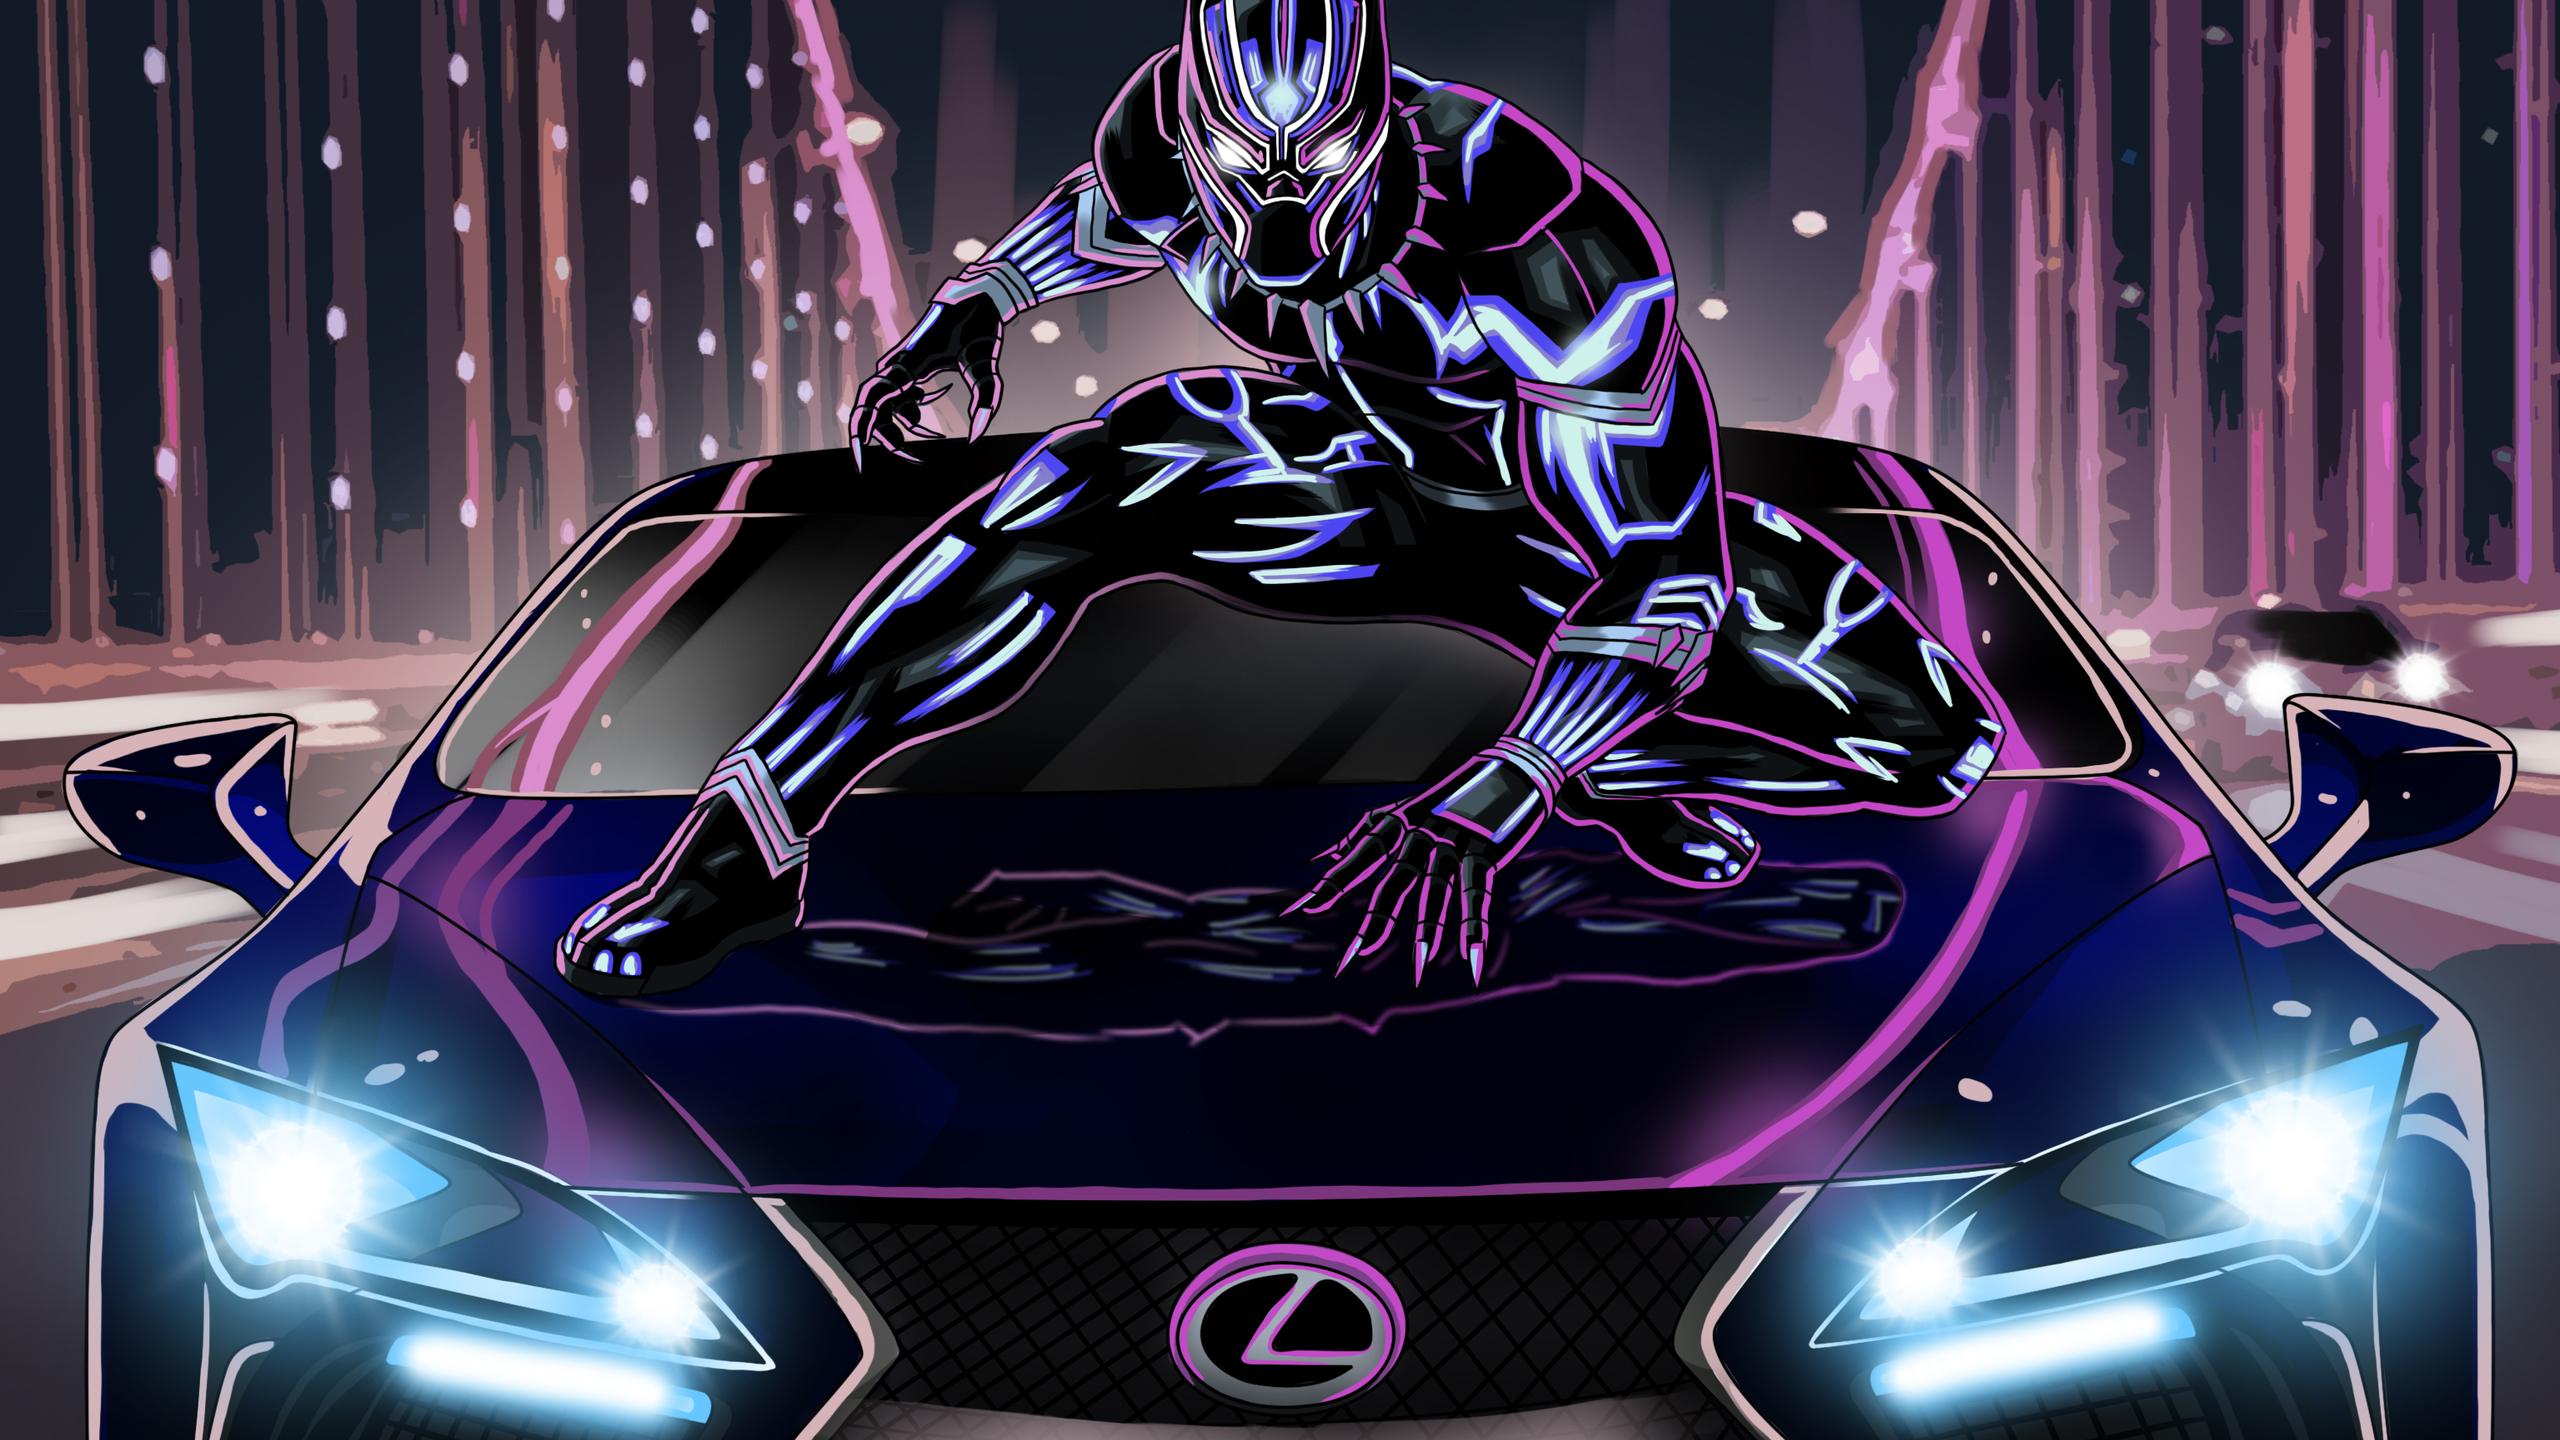 2560x1440 Black Panther Lexus Artwork 1440P Resolution HD ...